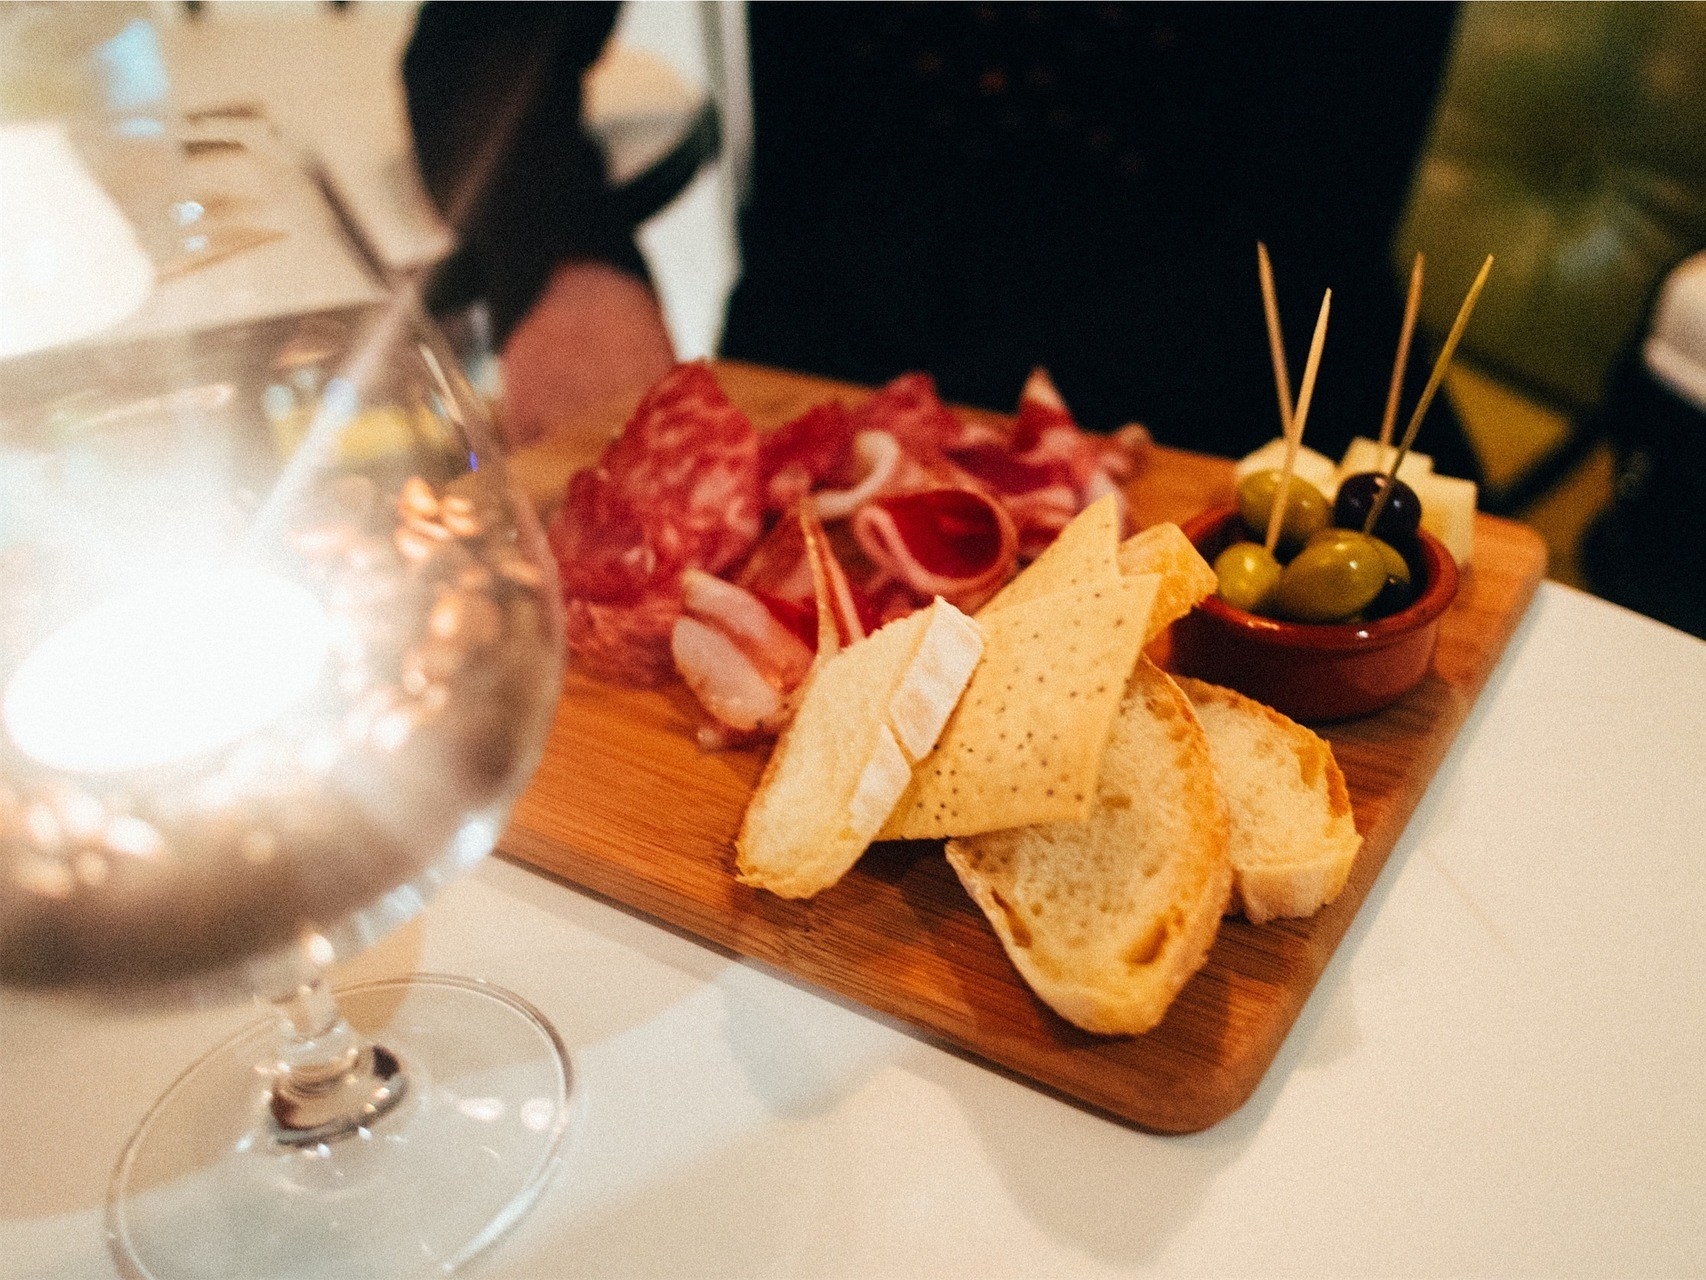 bar-a-bieres-paris-snack-charcuterie-fromage-olive-verre-pain